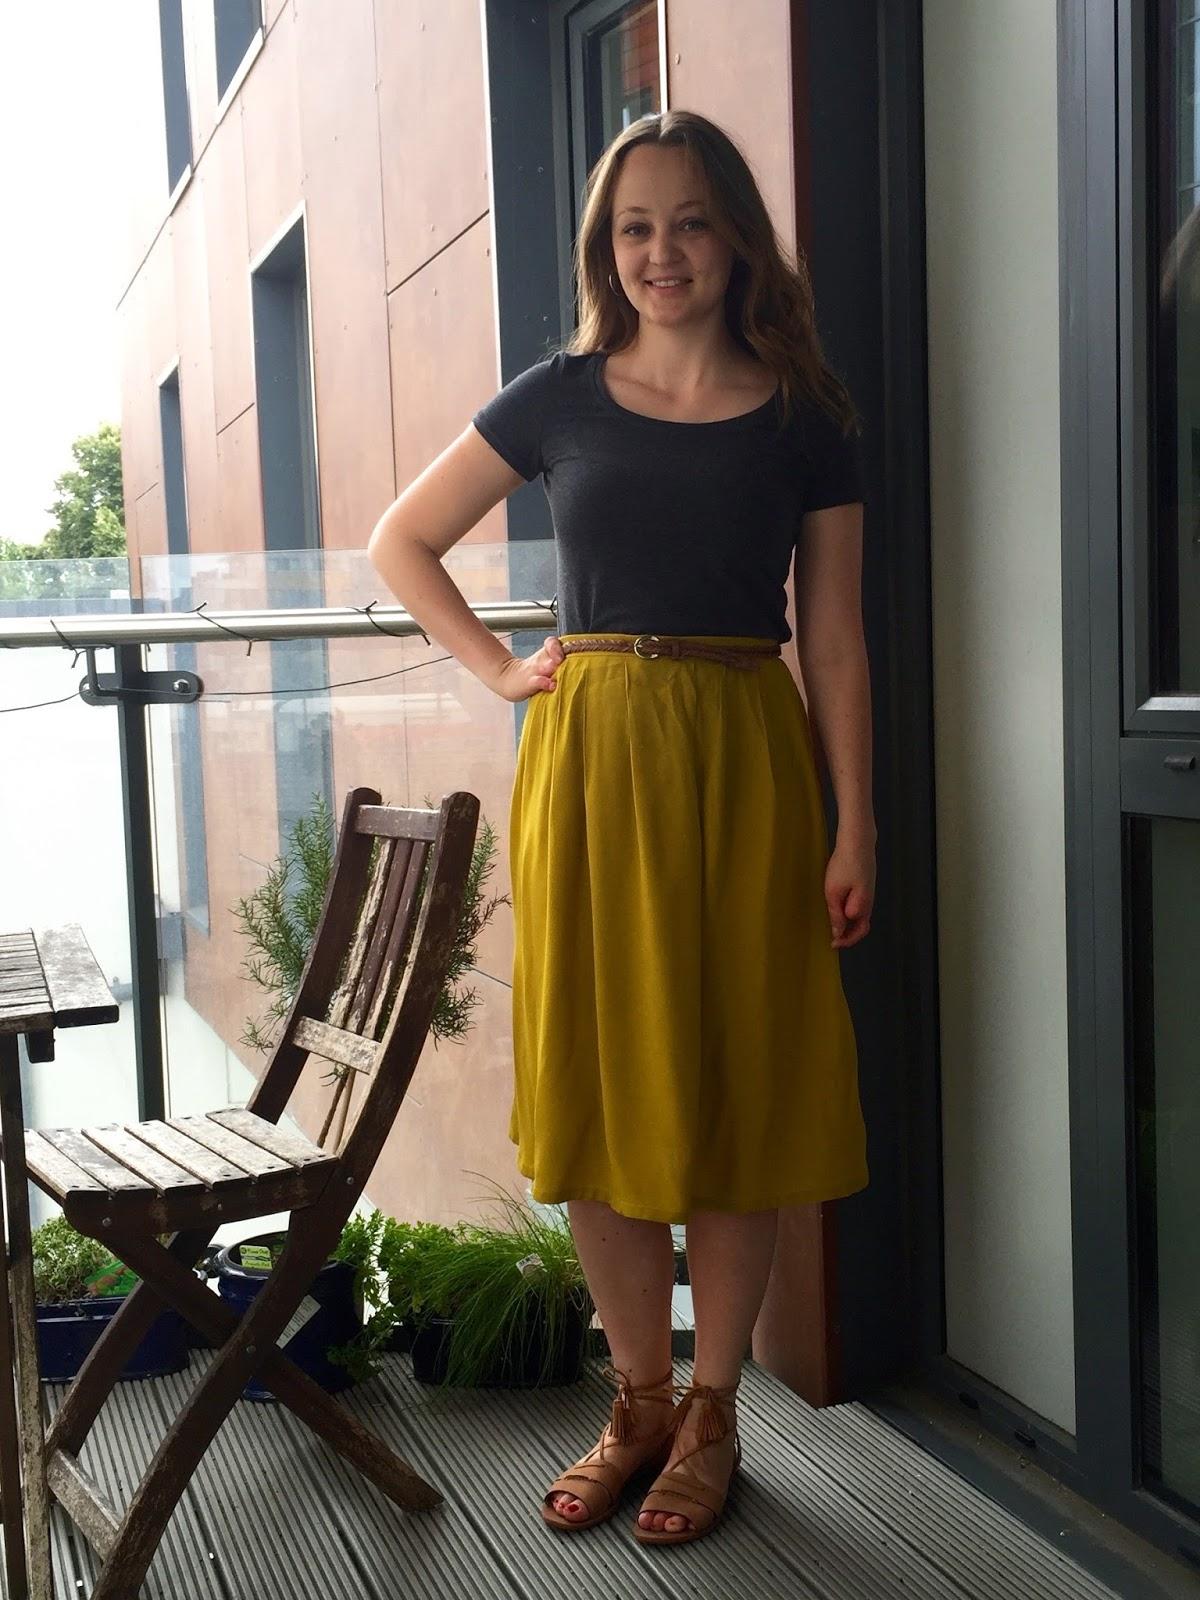 fab2eaaa05 Mustard Rayon Midi Skirt & Charcoal Renfrew Tee | Diary of a Chain ...